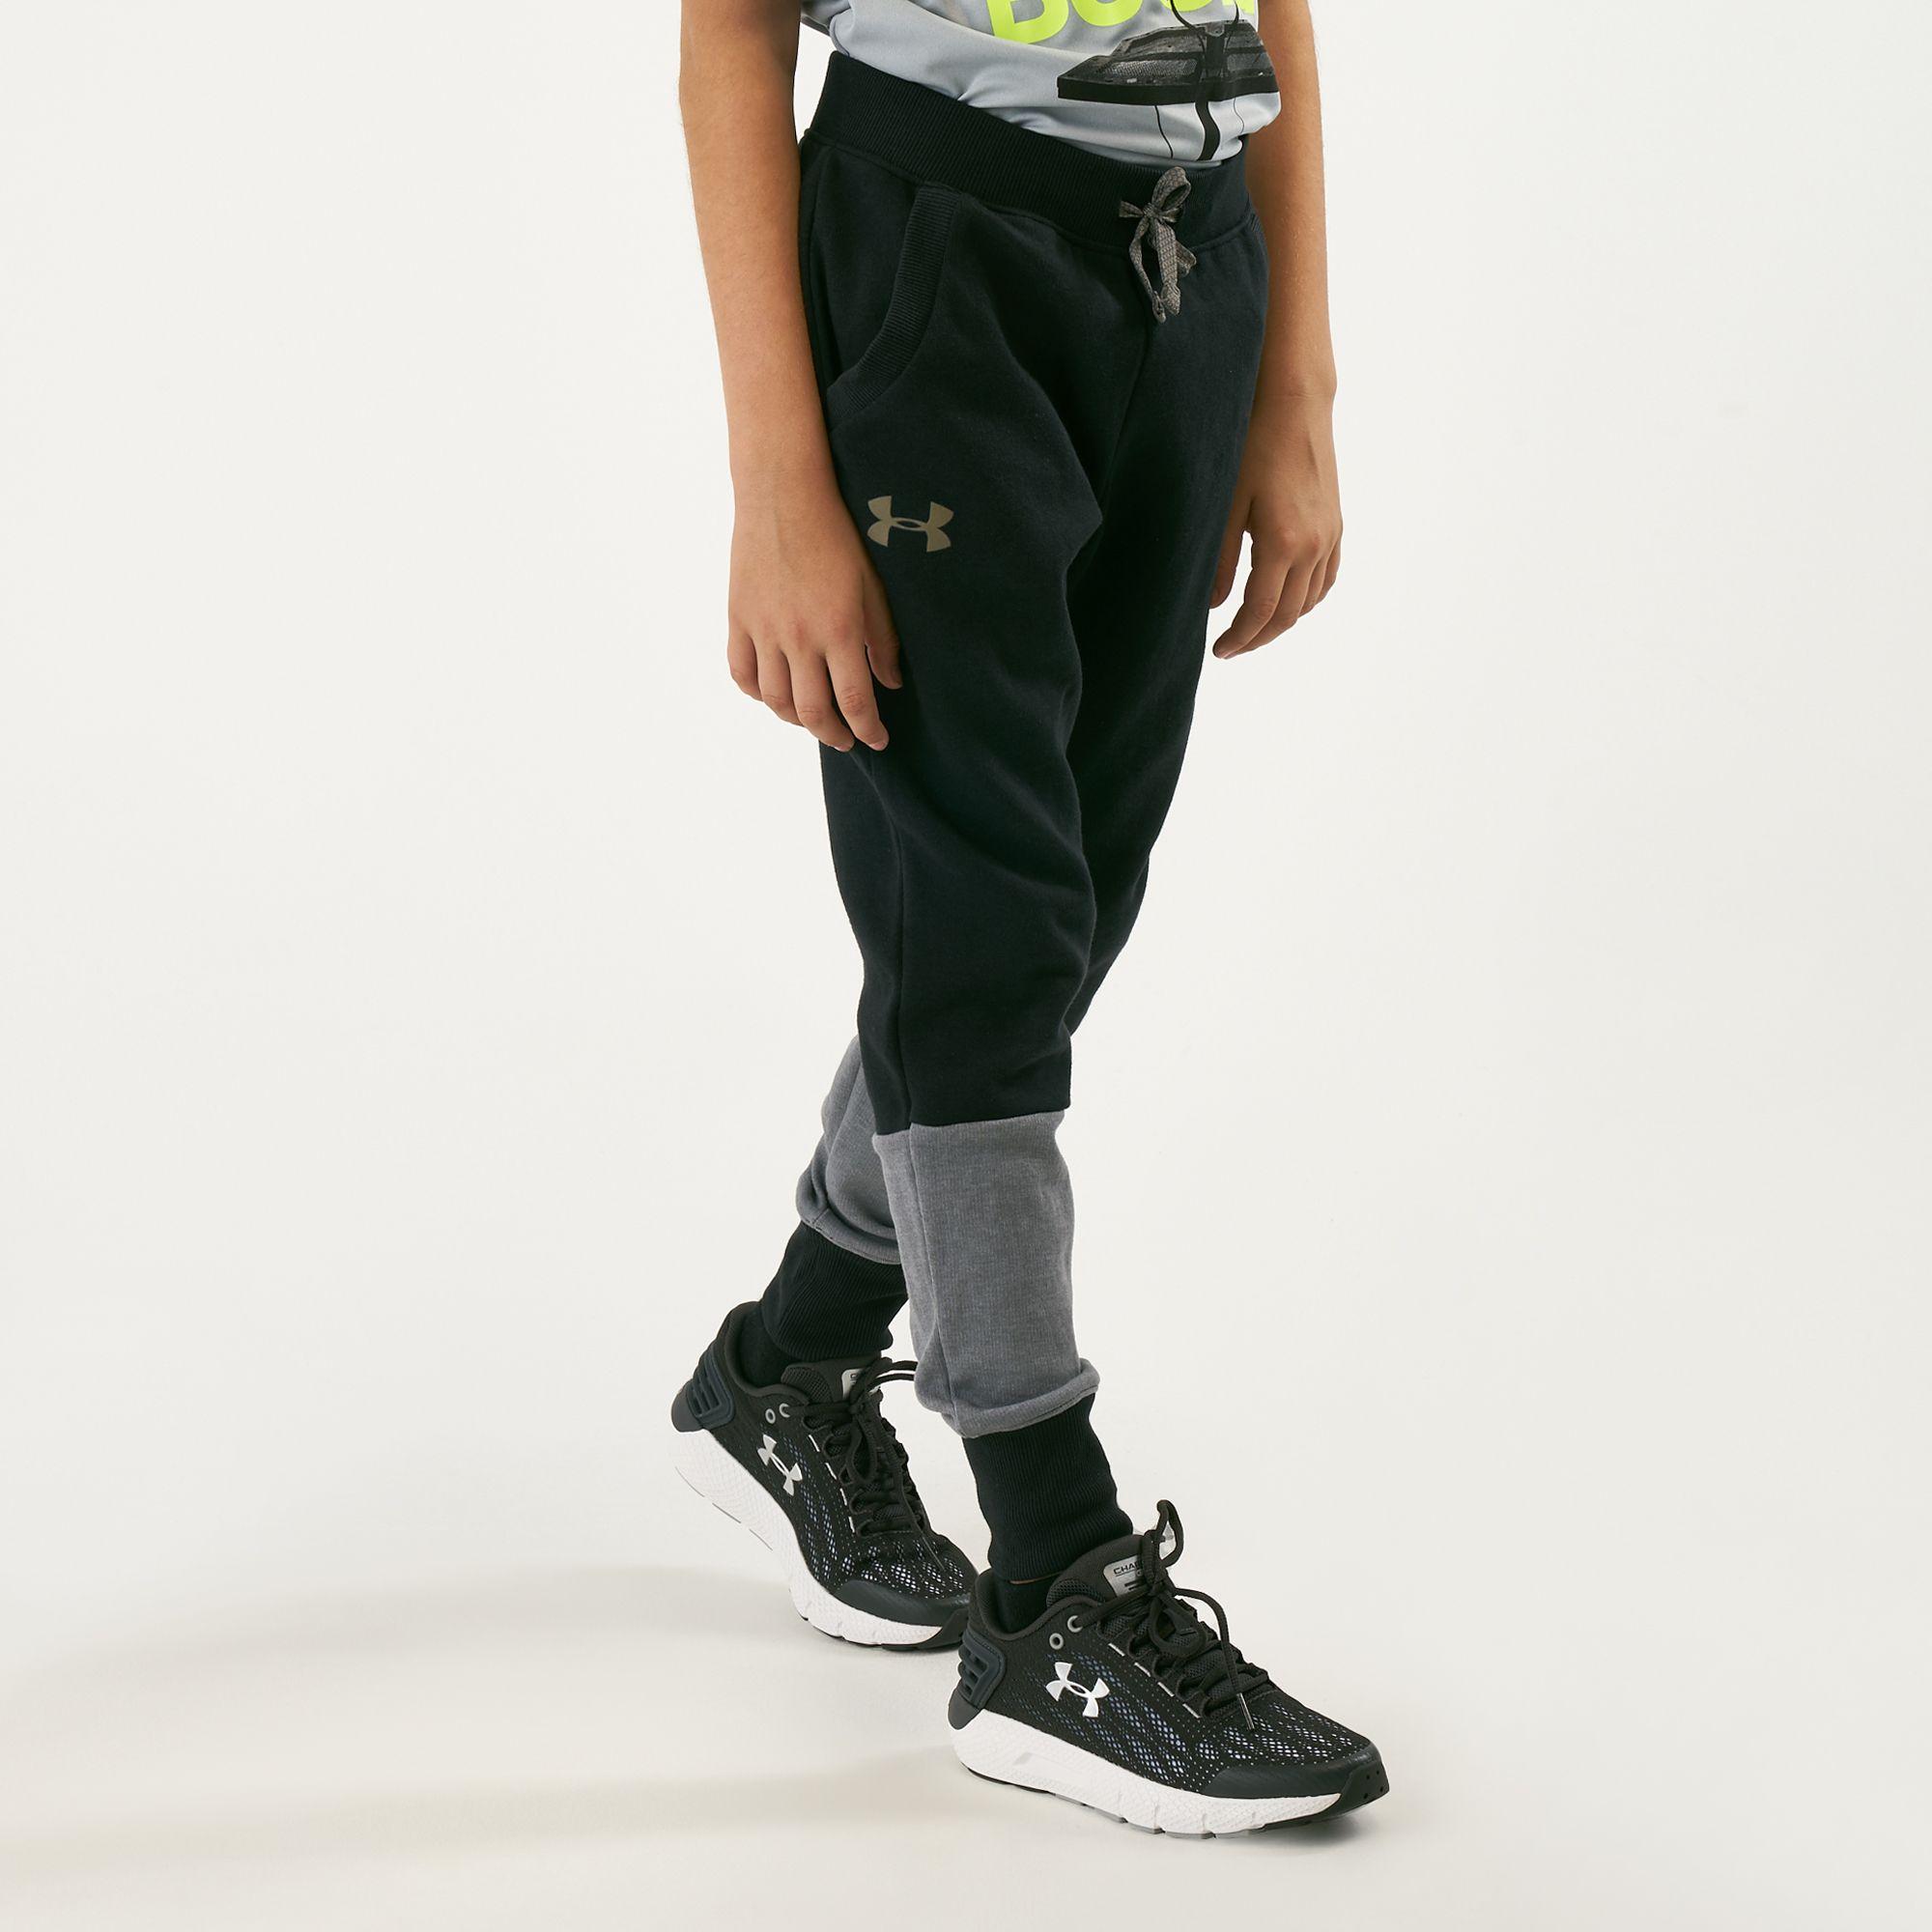 86a646d030f6f5 Under Armour Kids' Unstoppable Double Knit Jogger Pants | Pants ...